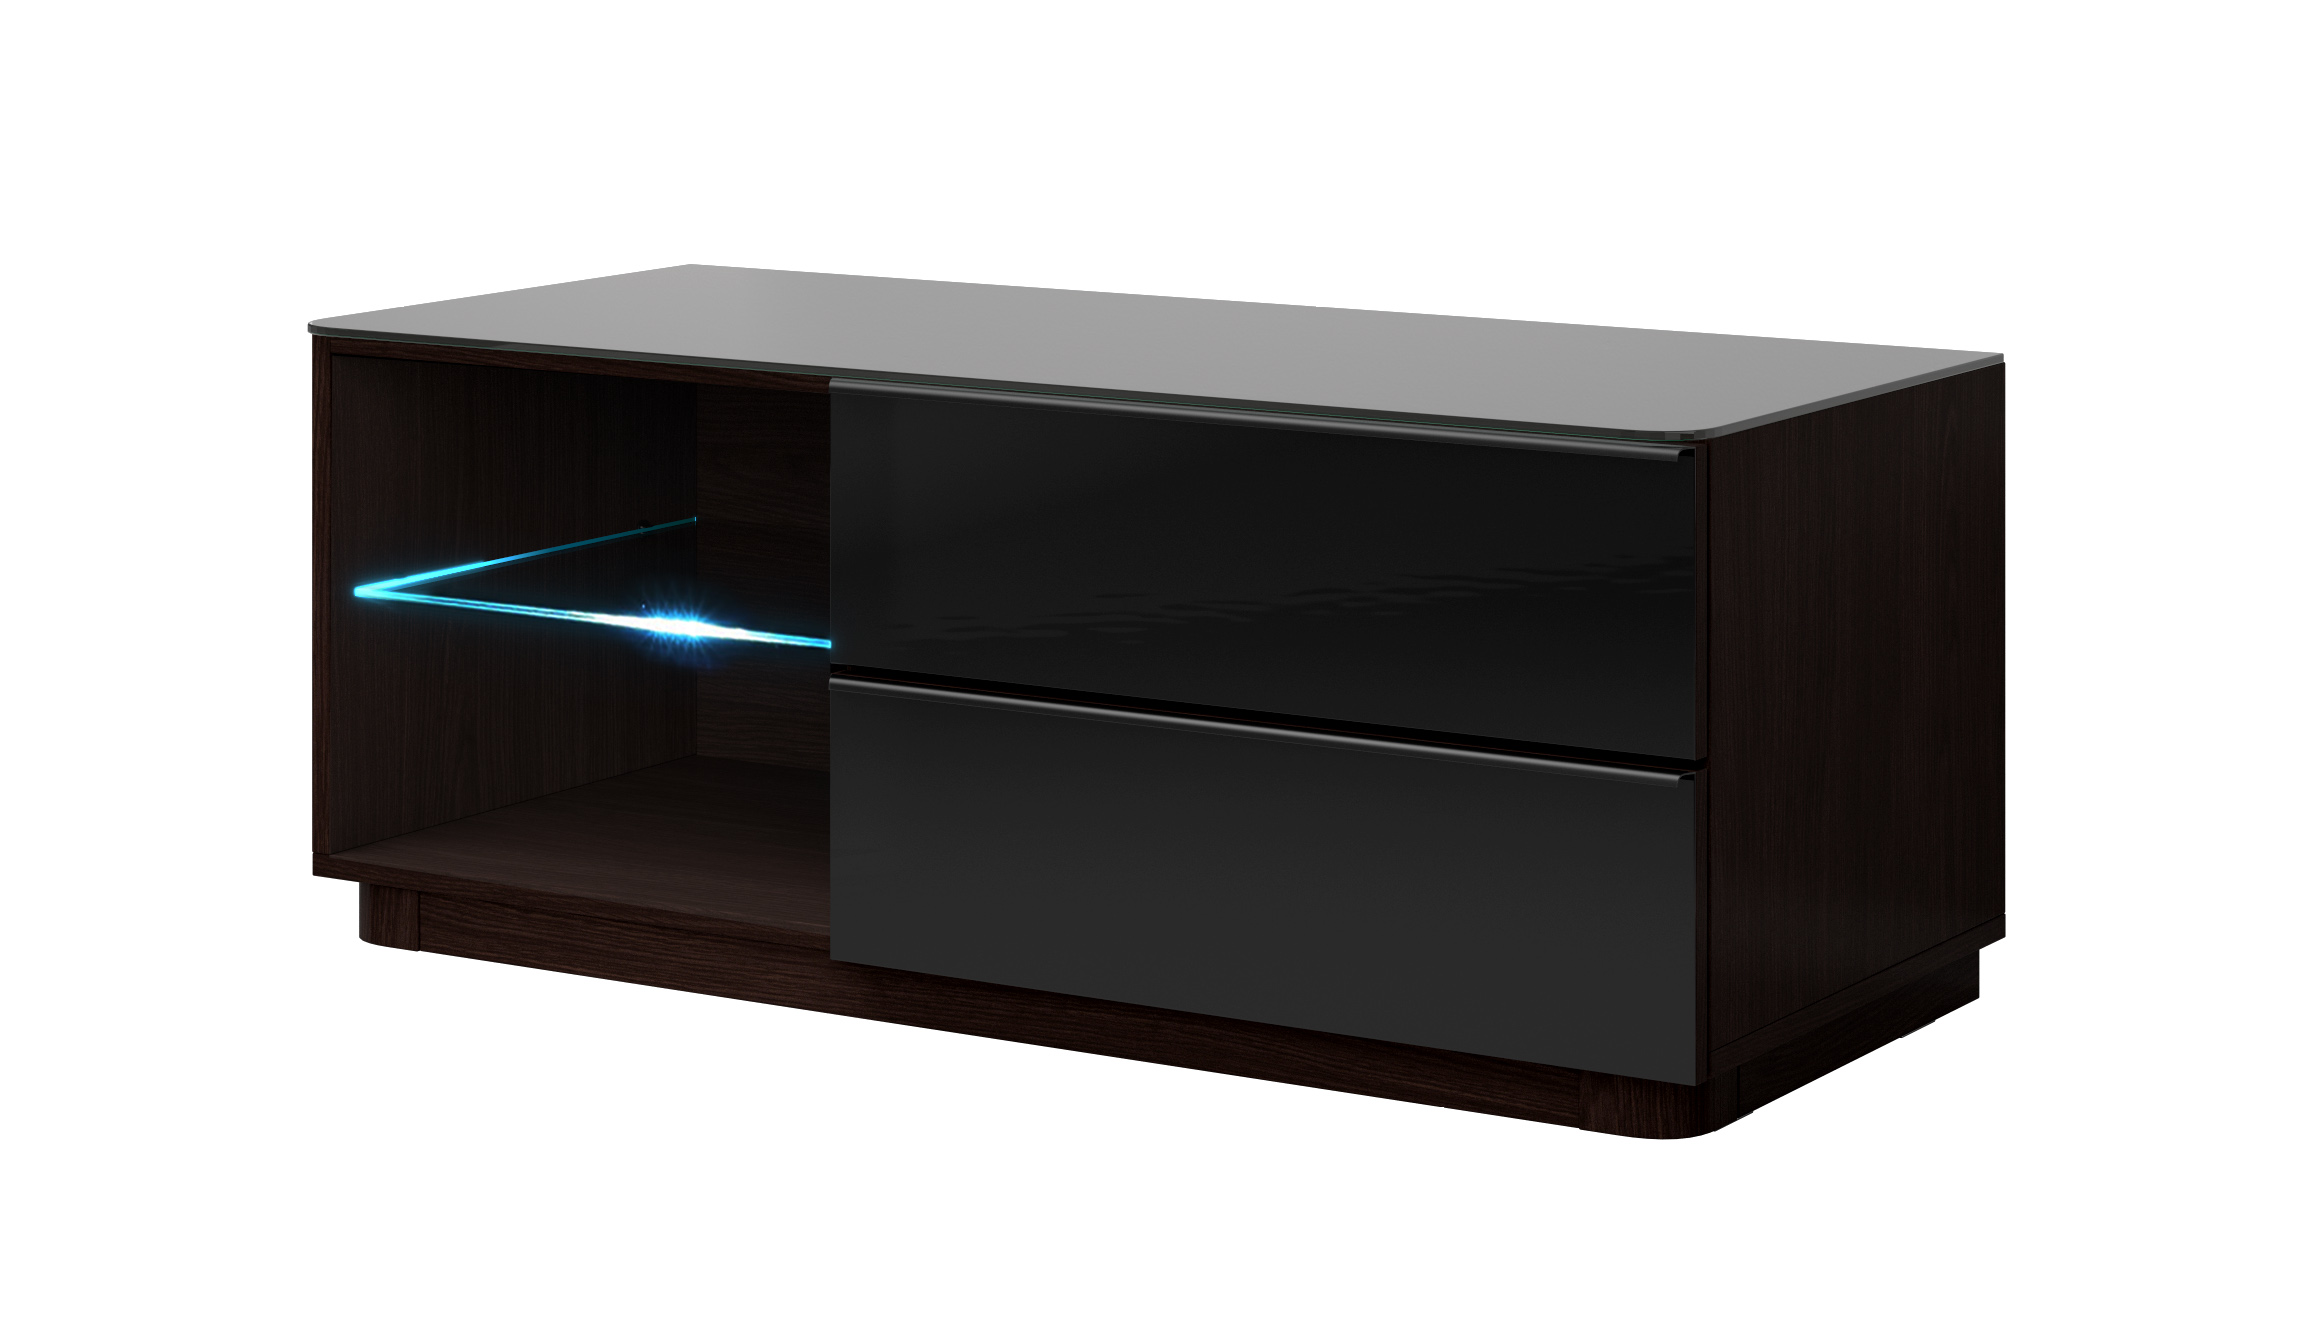 TV stolek/skříňka - Toft - Typ 41 (wenge + černé sklo)